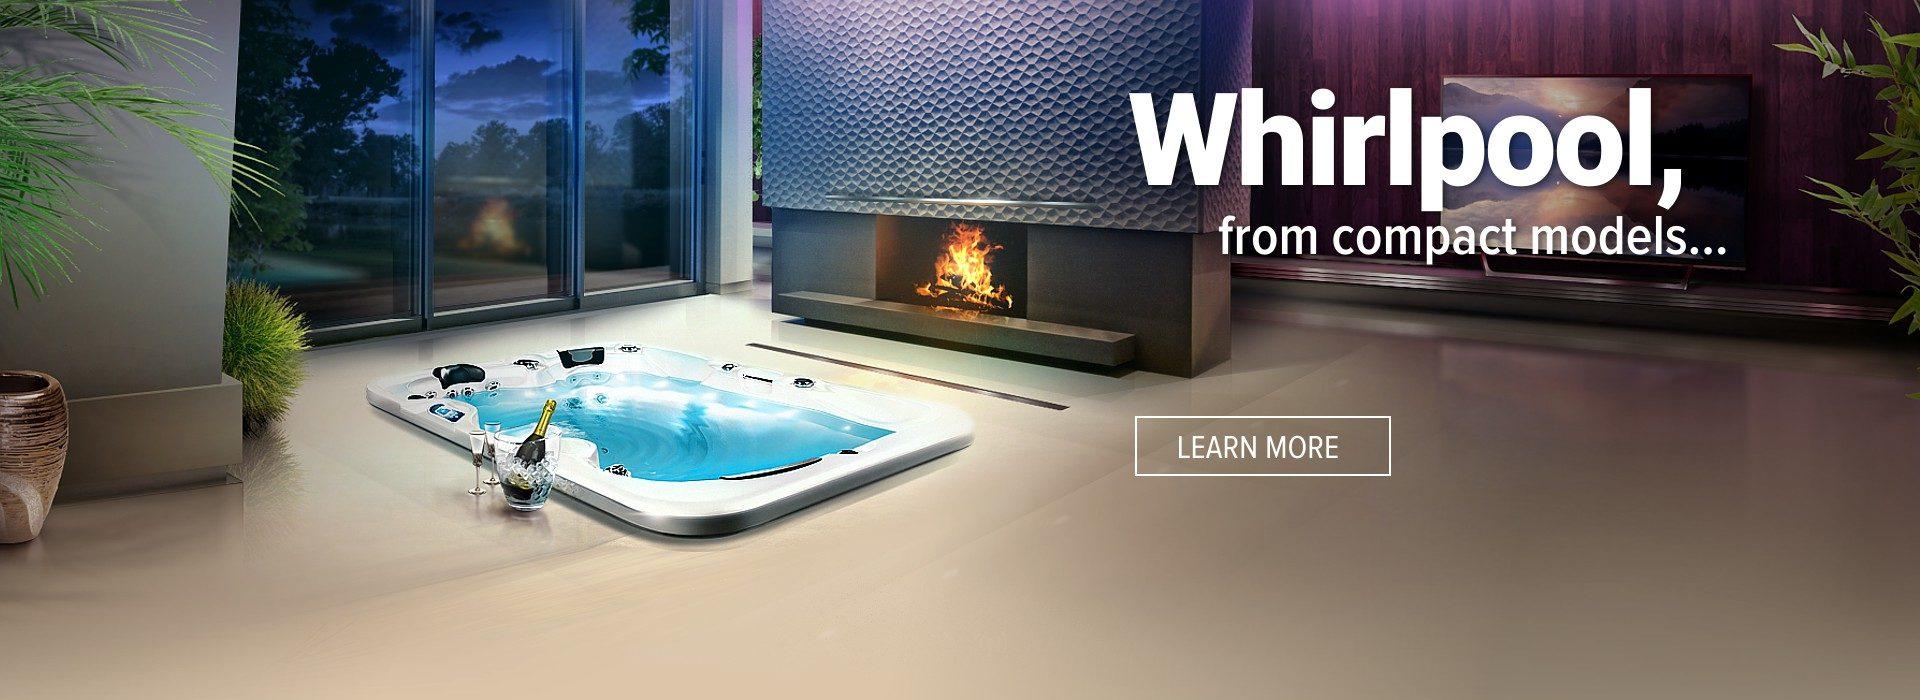 Whirlpool Canadian Spa International® - Outdoor jacuzzi, hot tubs and swim spa – Spa Studio